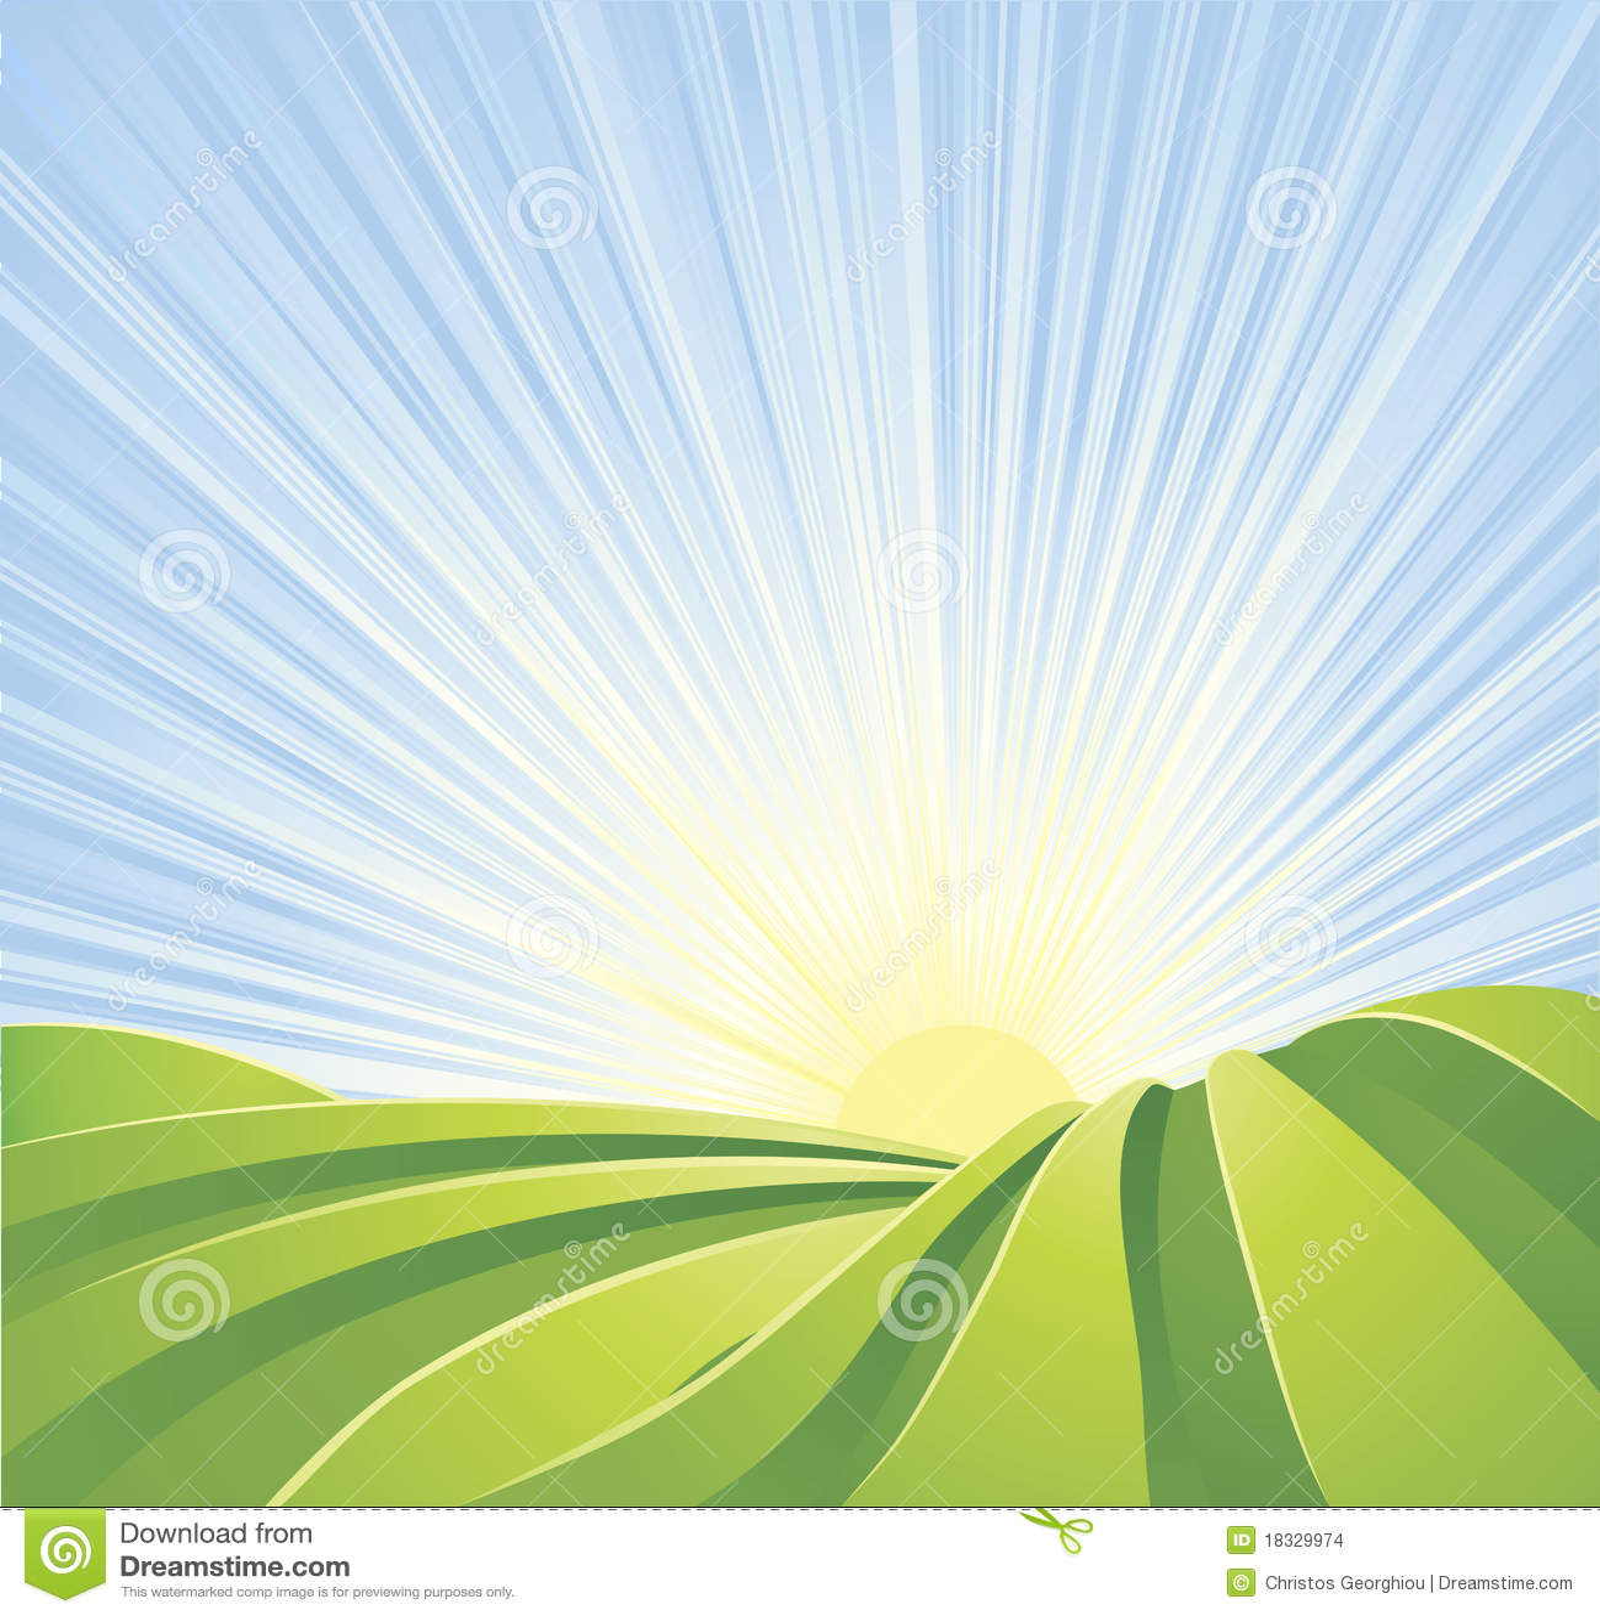 Idyllic green fields with sun rays blue sky